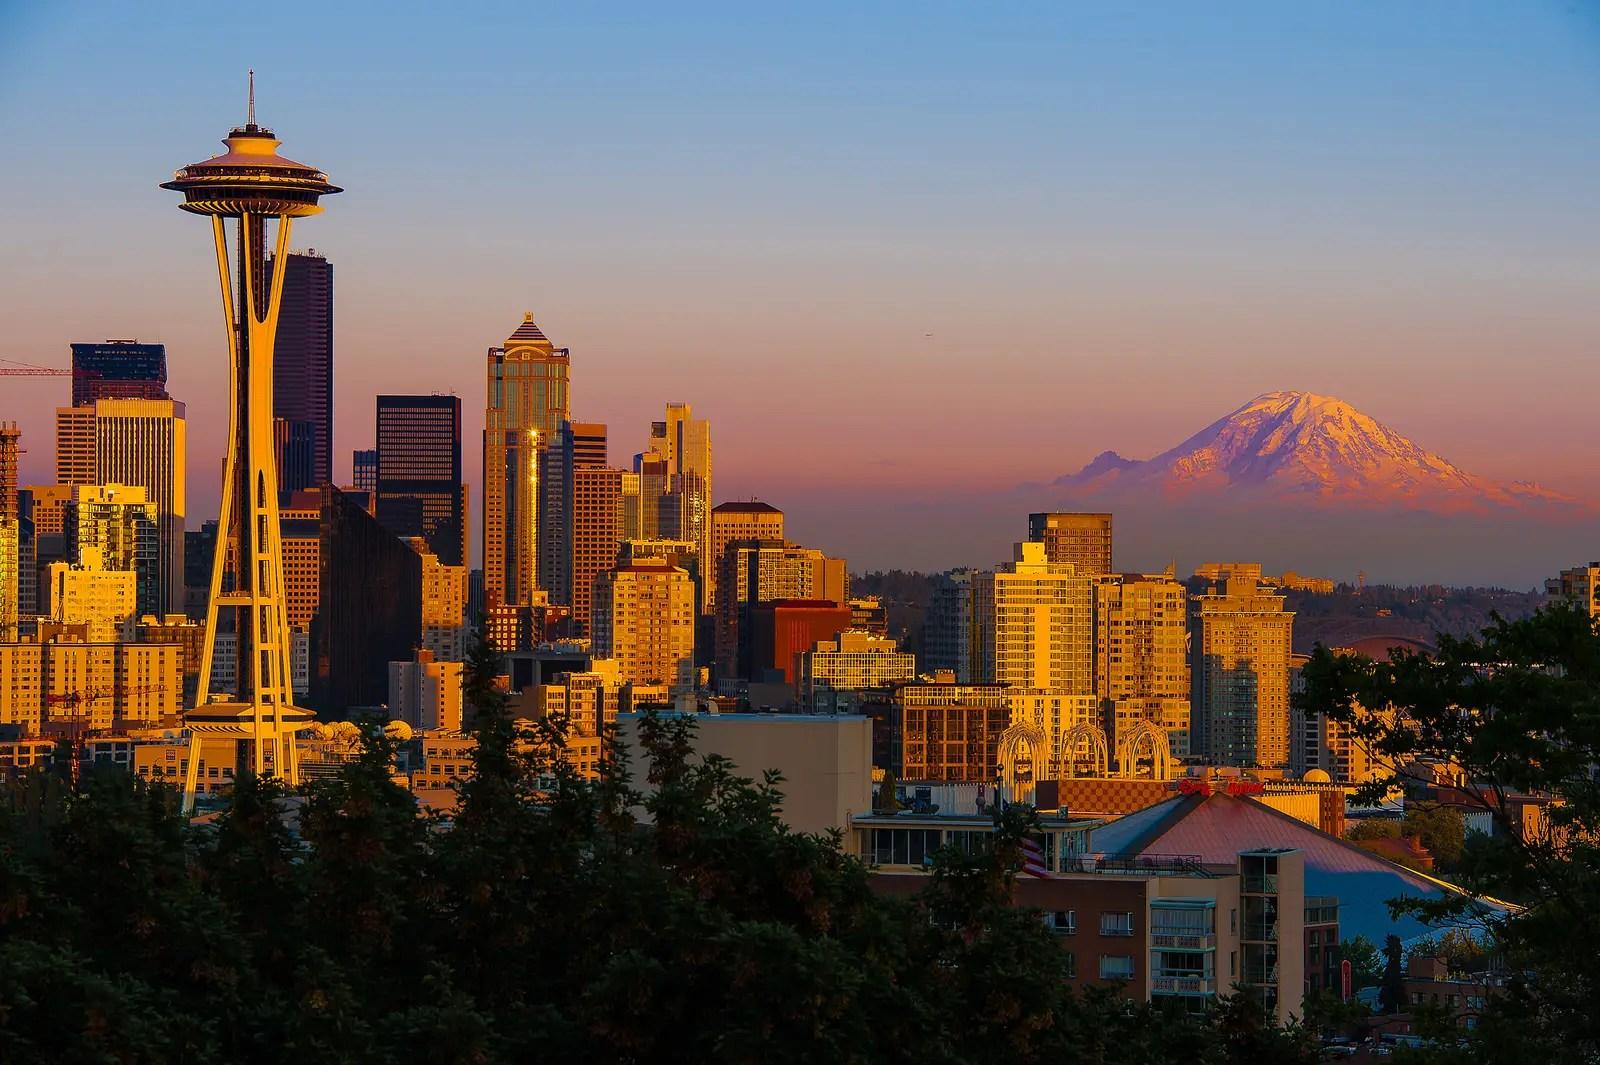 10. Seattle: 47.23 hours